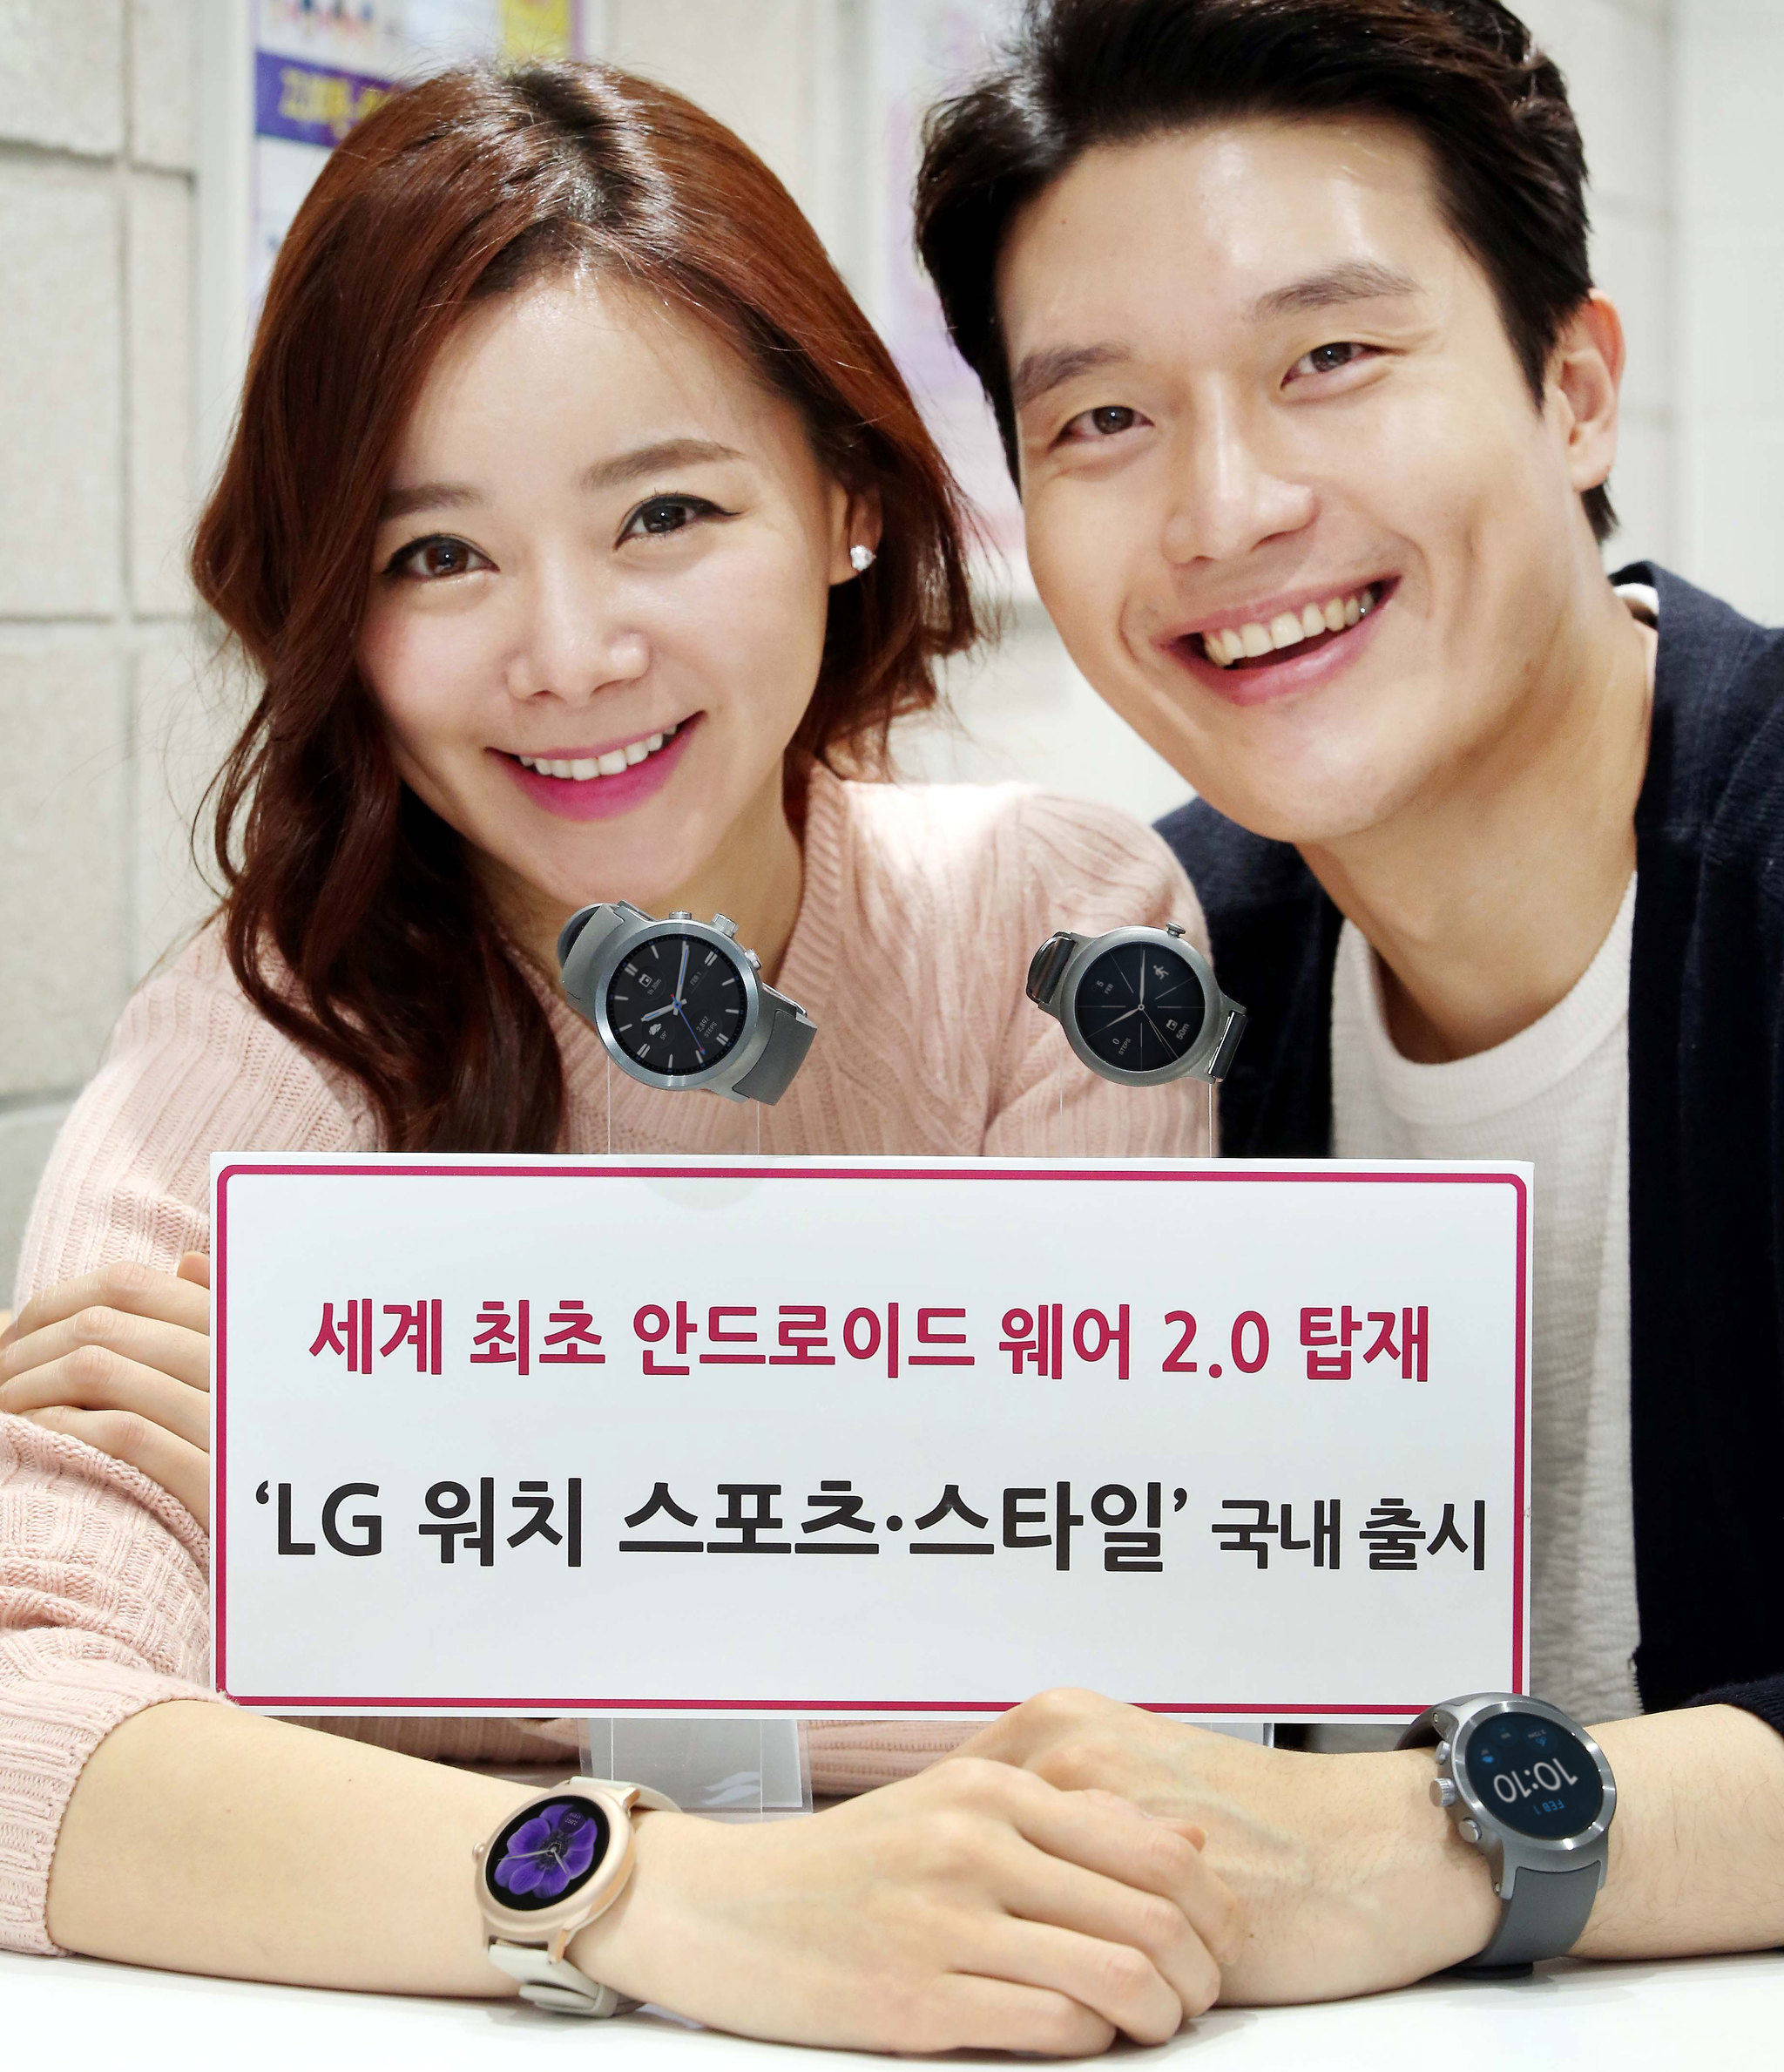 LG전자는 10일 스마트폰 없이도 애플리케이션을 다운받을 수 있는 'LG 워치 스포츠'와 'LG 워치 스타일'을 출시했다. [사진 LG전자]